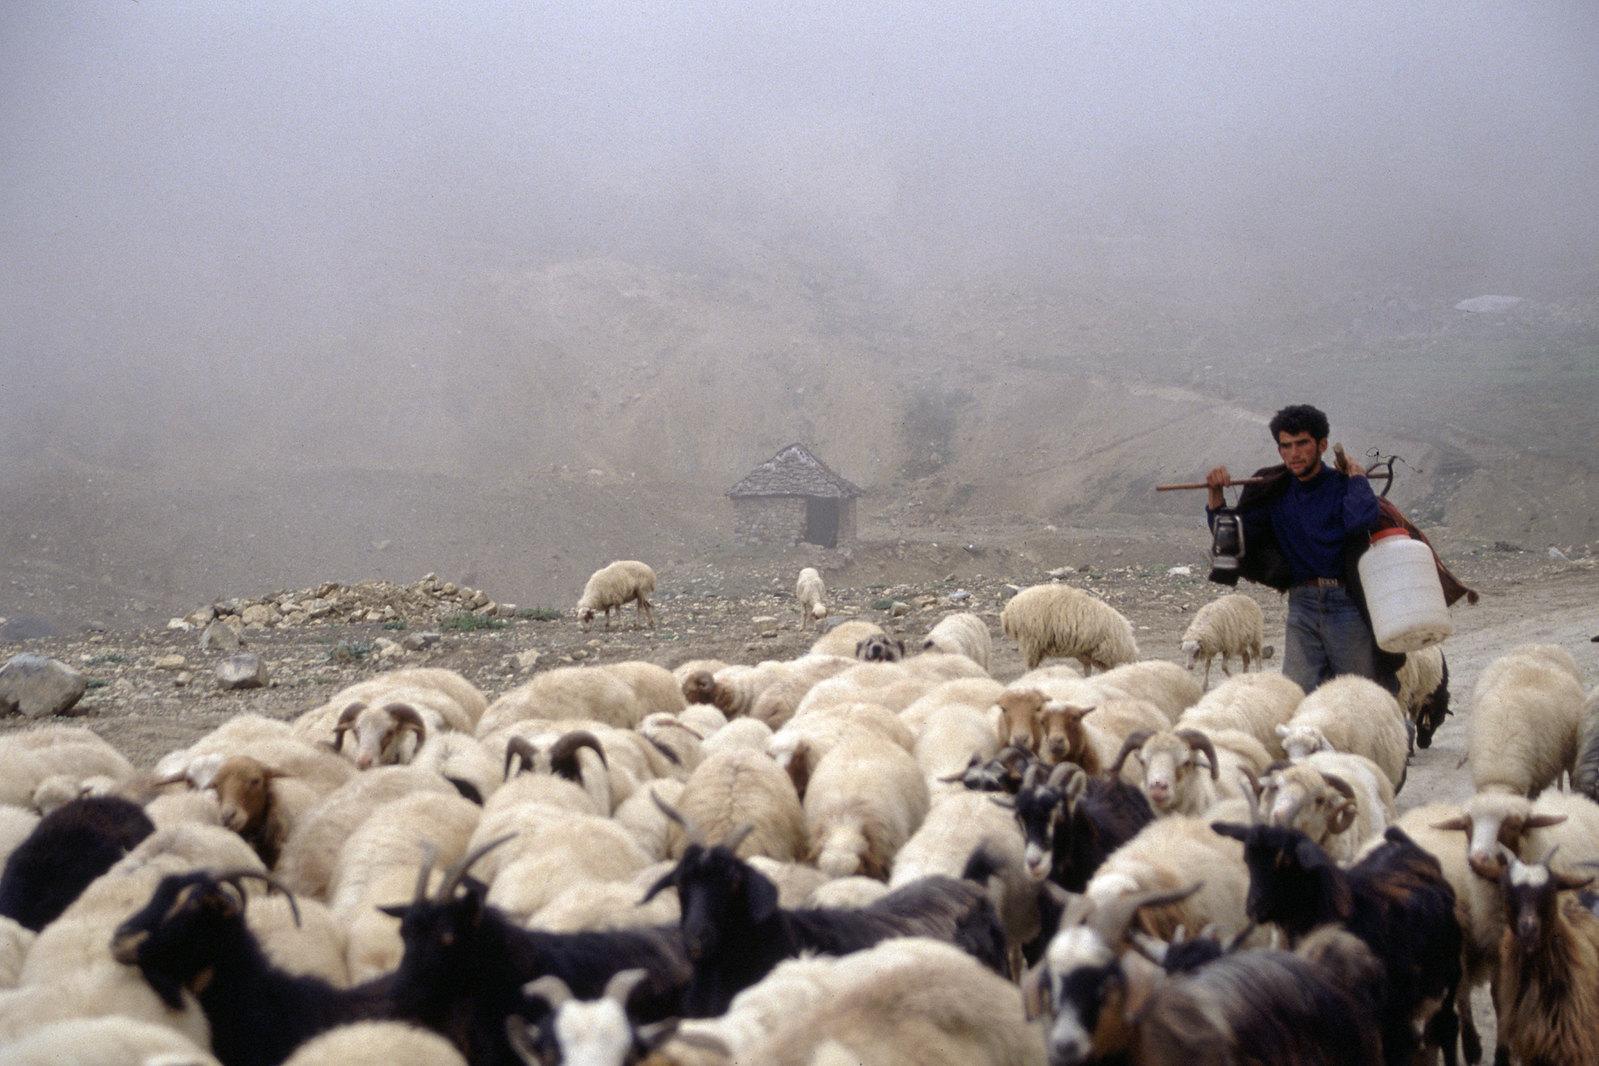 Road trip en Iran - Rencontre dans la montagne